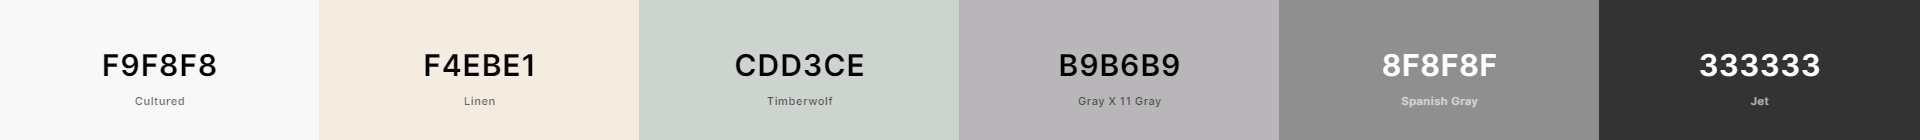 Paleta minimalista